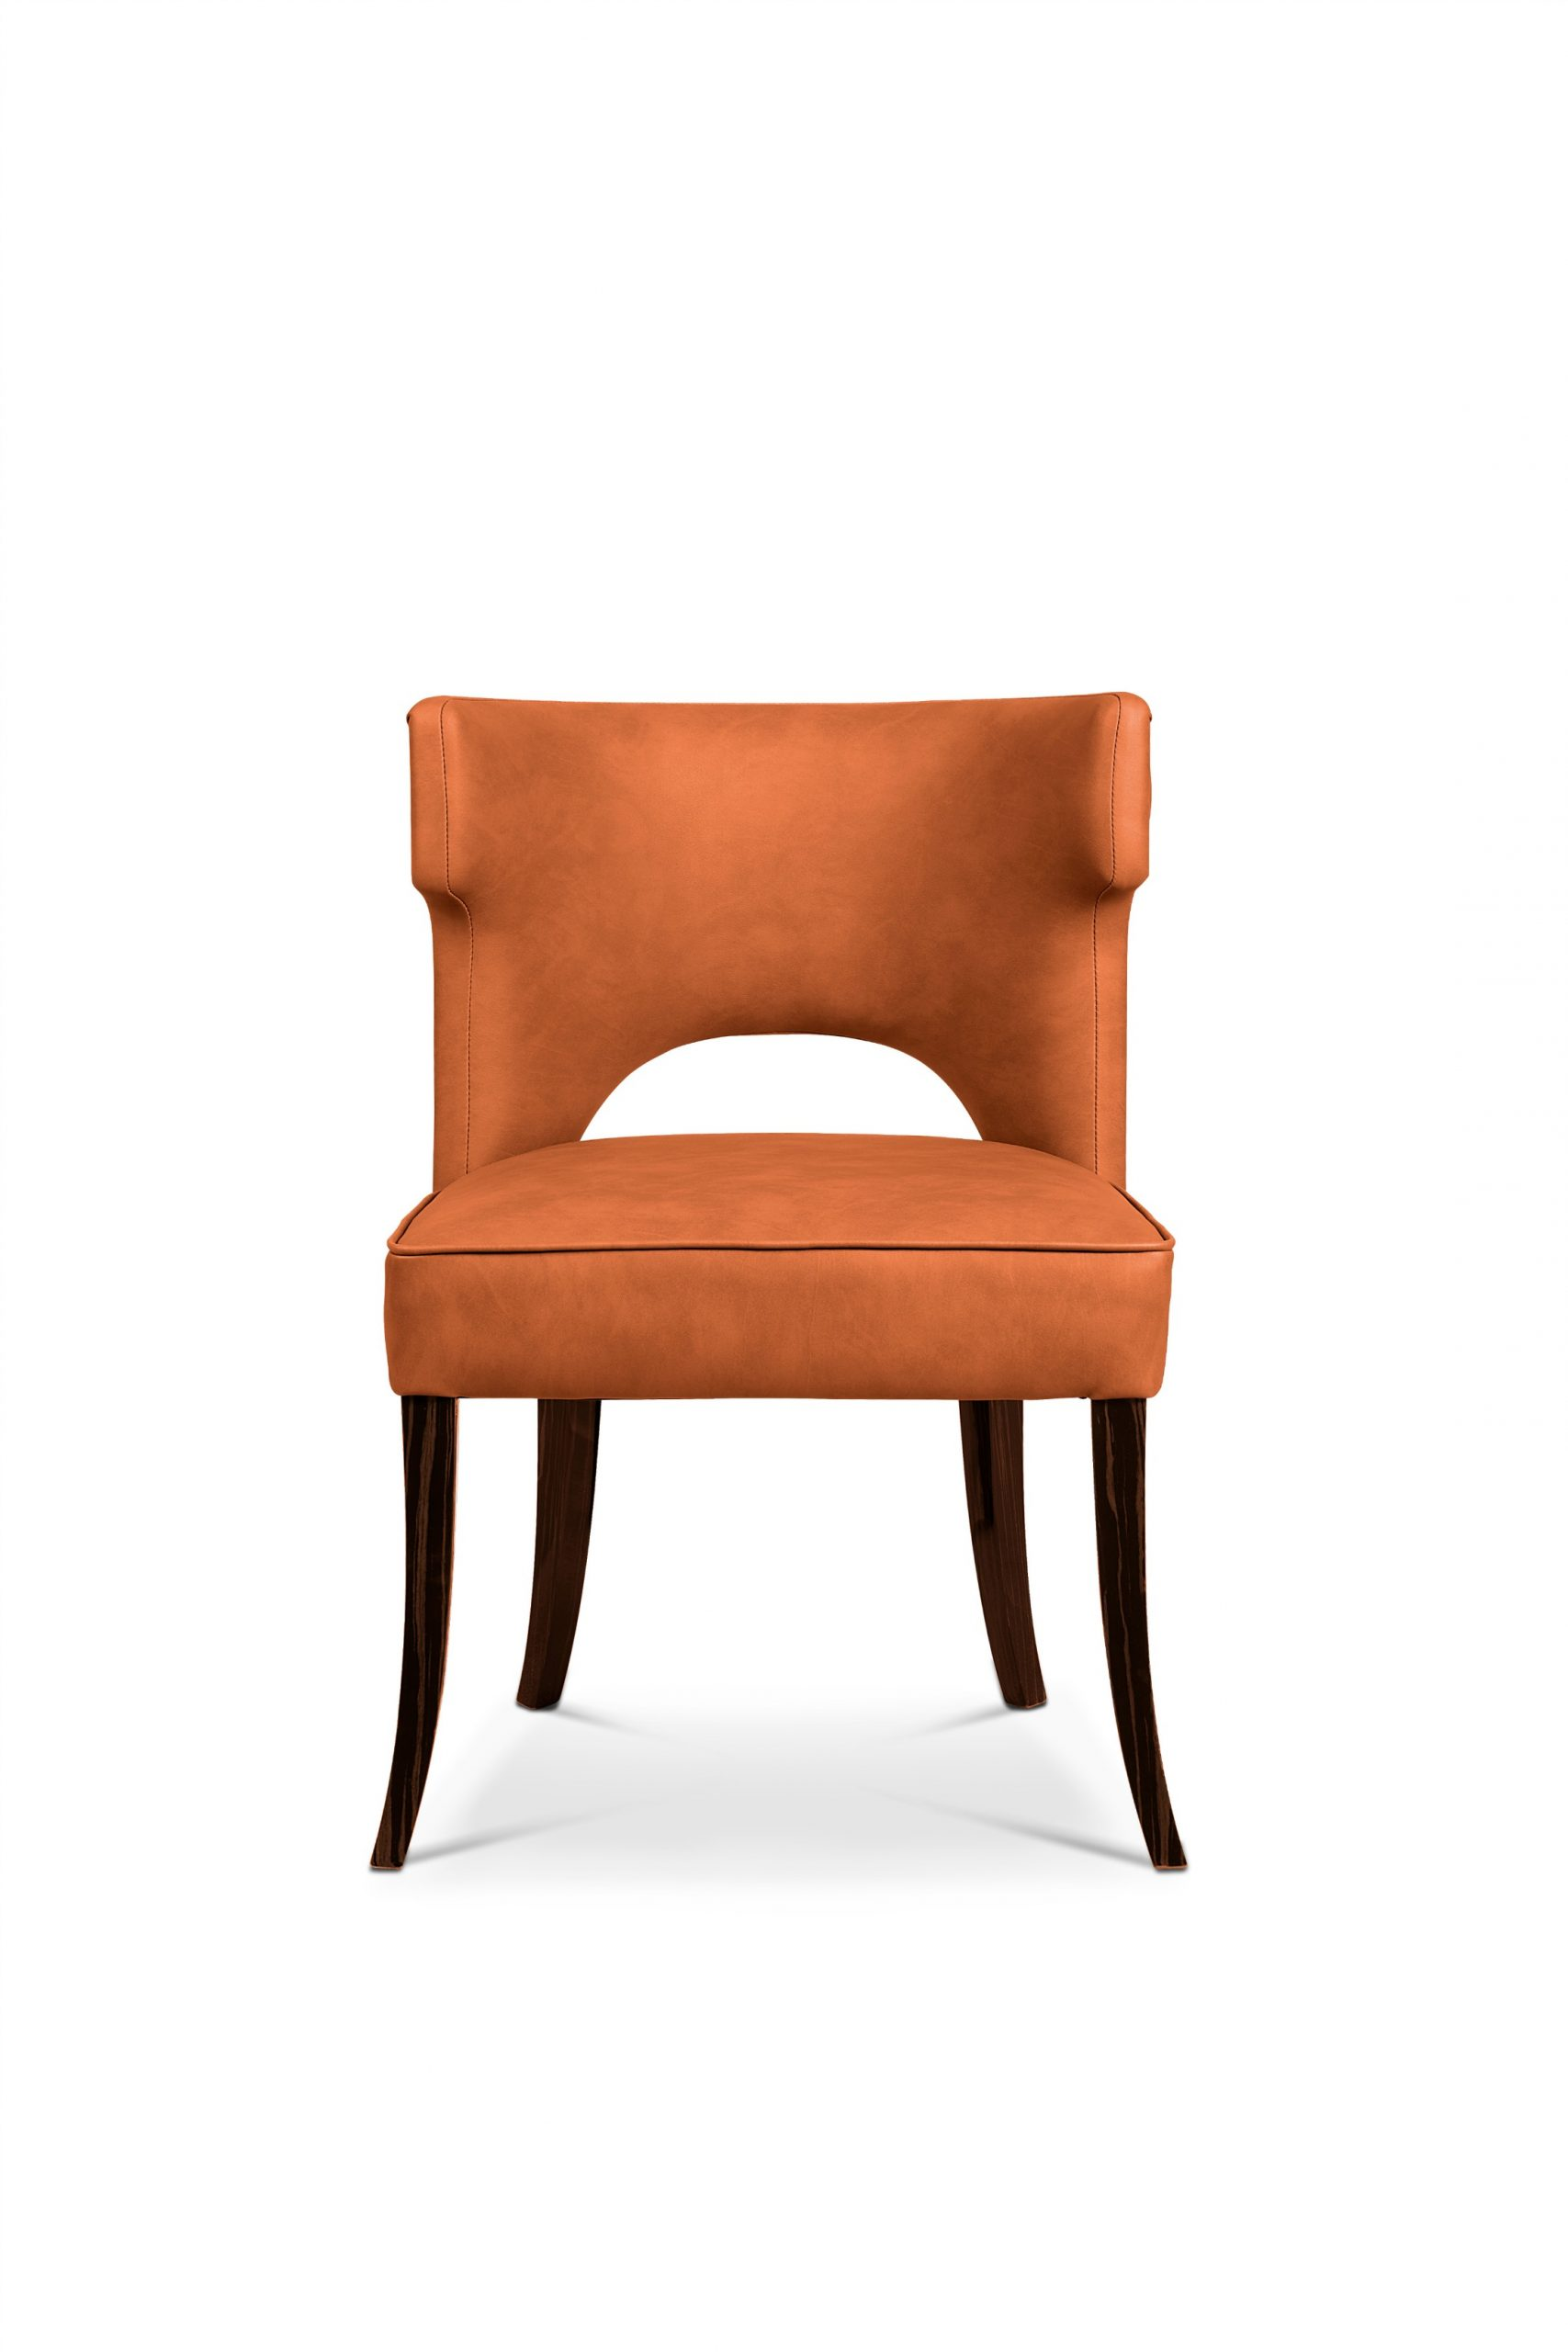 STOLA Dining Chair; Dining Chair; Upholstery; Modern; Sophistication; Elegance; Classiness; Comfort; Fierceness; BRABBU; Design; Furniture stola dining chairSTOLA Dining Chair: A Symbol of Elegance and Sophisticationkansas dining chair 1 HR scaled